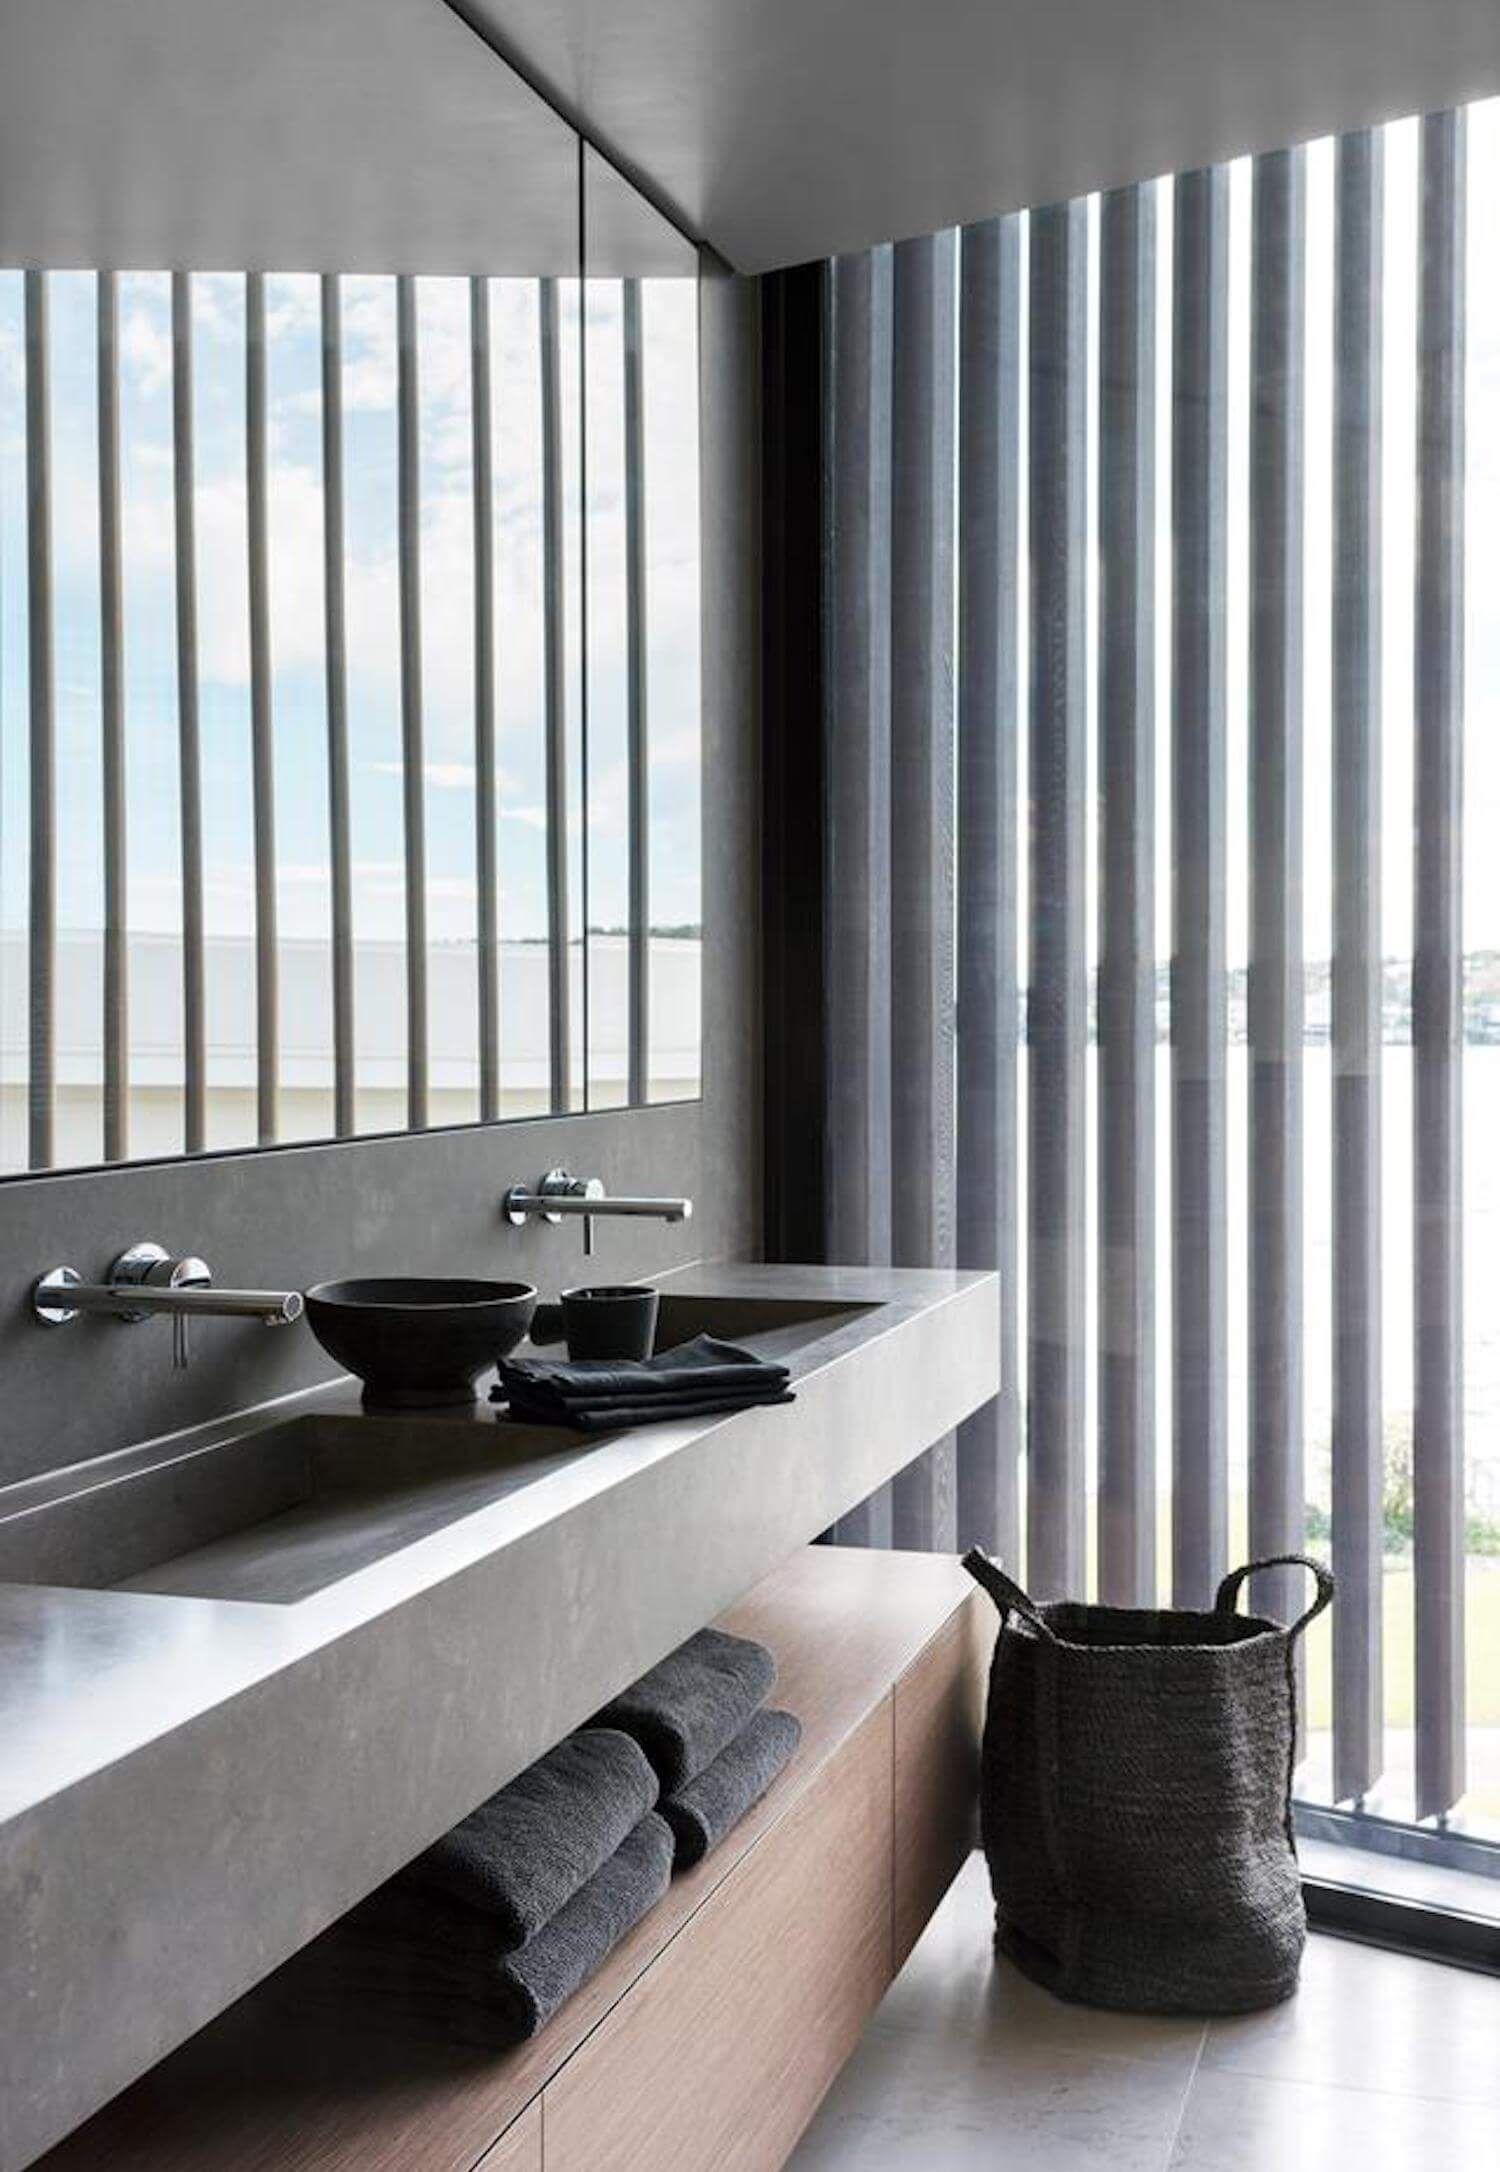 gessi european design for global bathrooms bathroom bathroom rh pinterest com